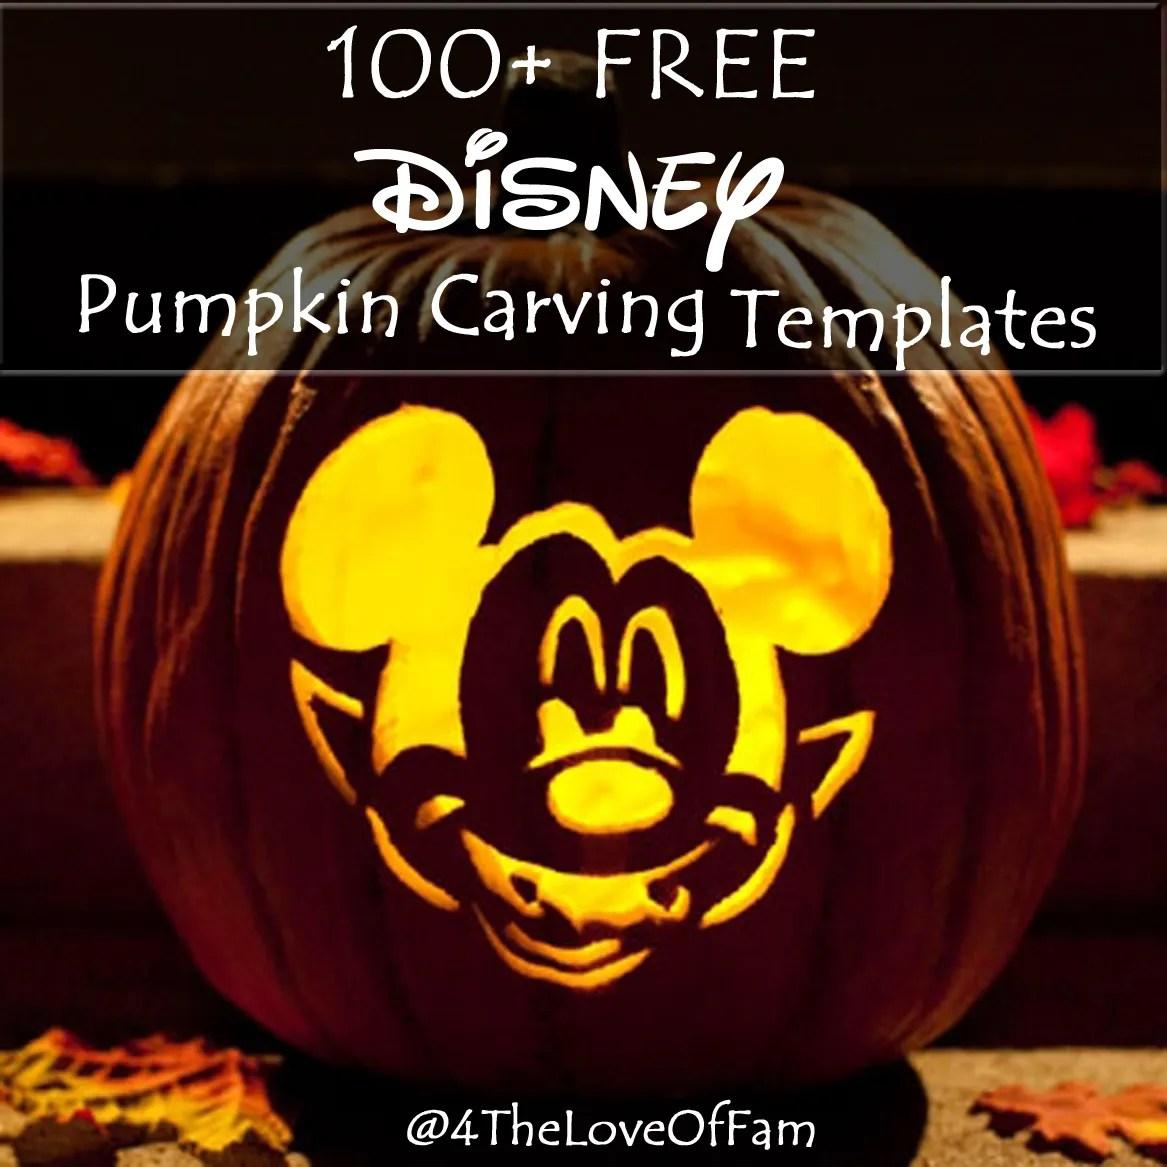 toy story pumpkin template free - Romeo.landinez.co